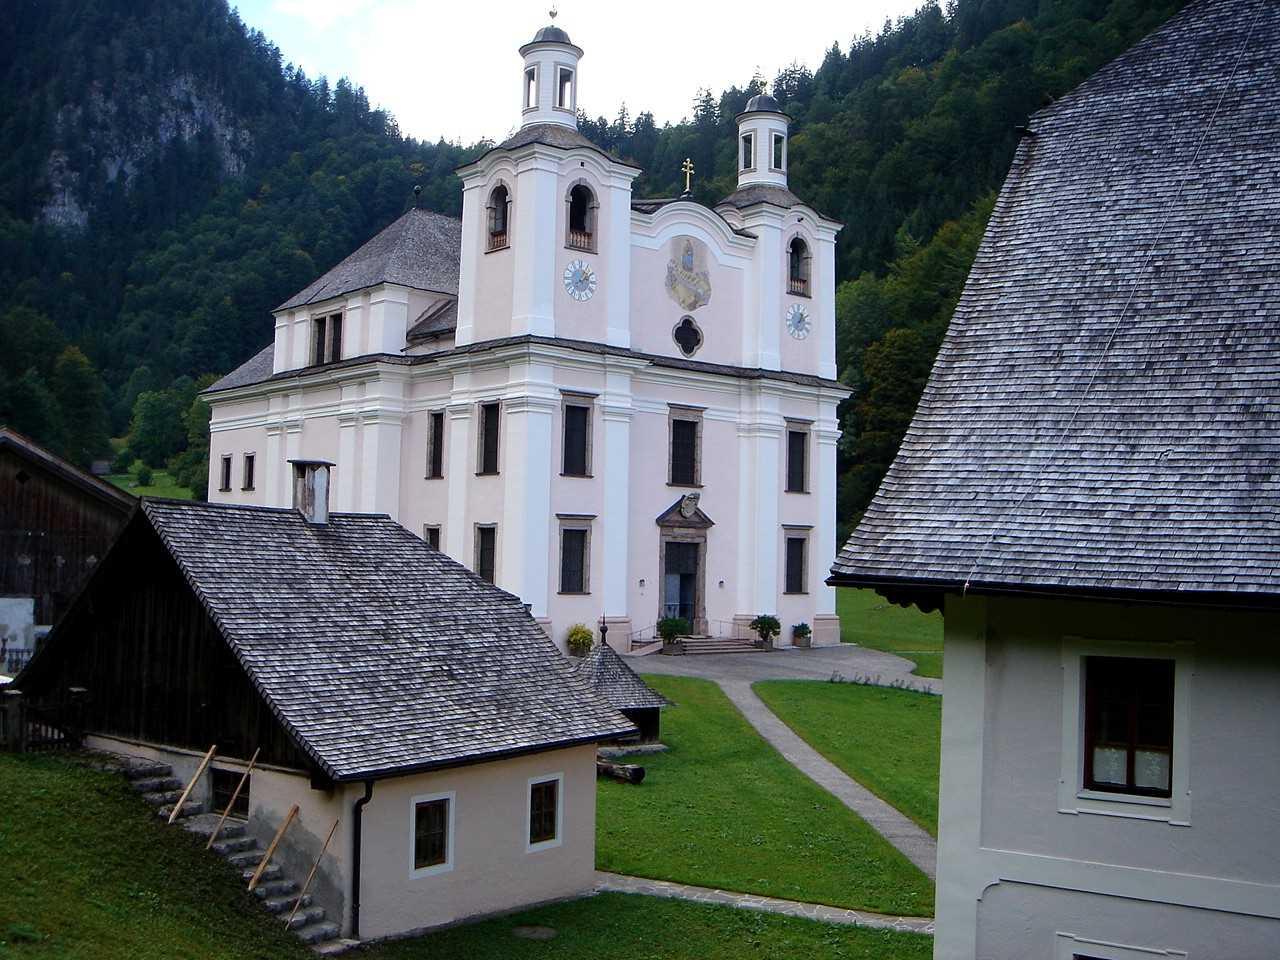 Foto: Manfred Karl / Wander Tour / Großes Ochsenhorn über Schärdinger Steig / Kirchental ist der Ausgangspunkt der Tour. / 16.06.2007 00:19:35